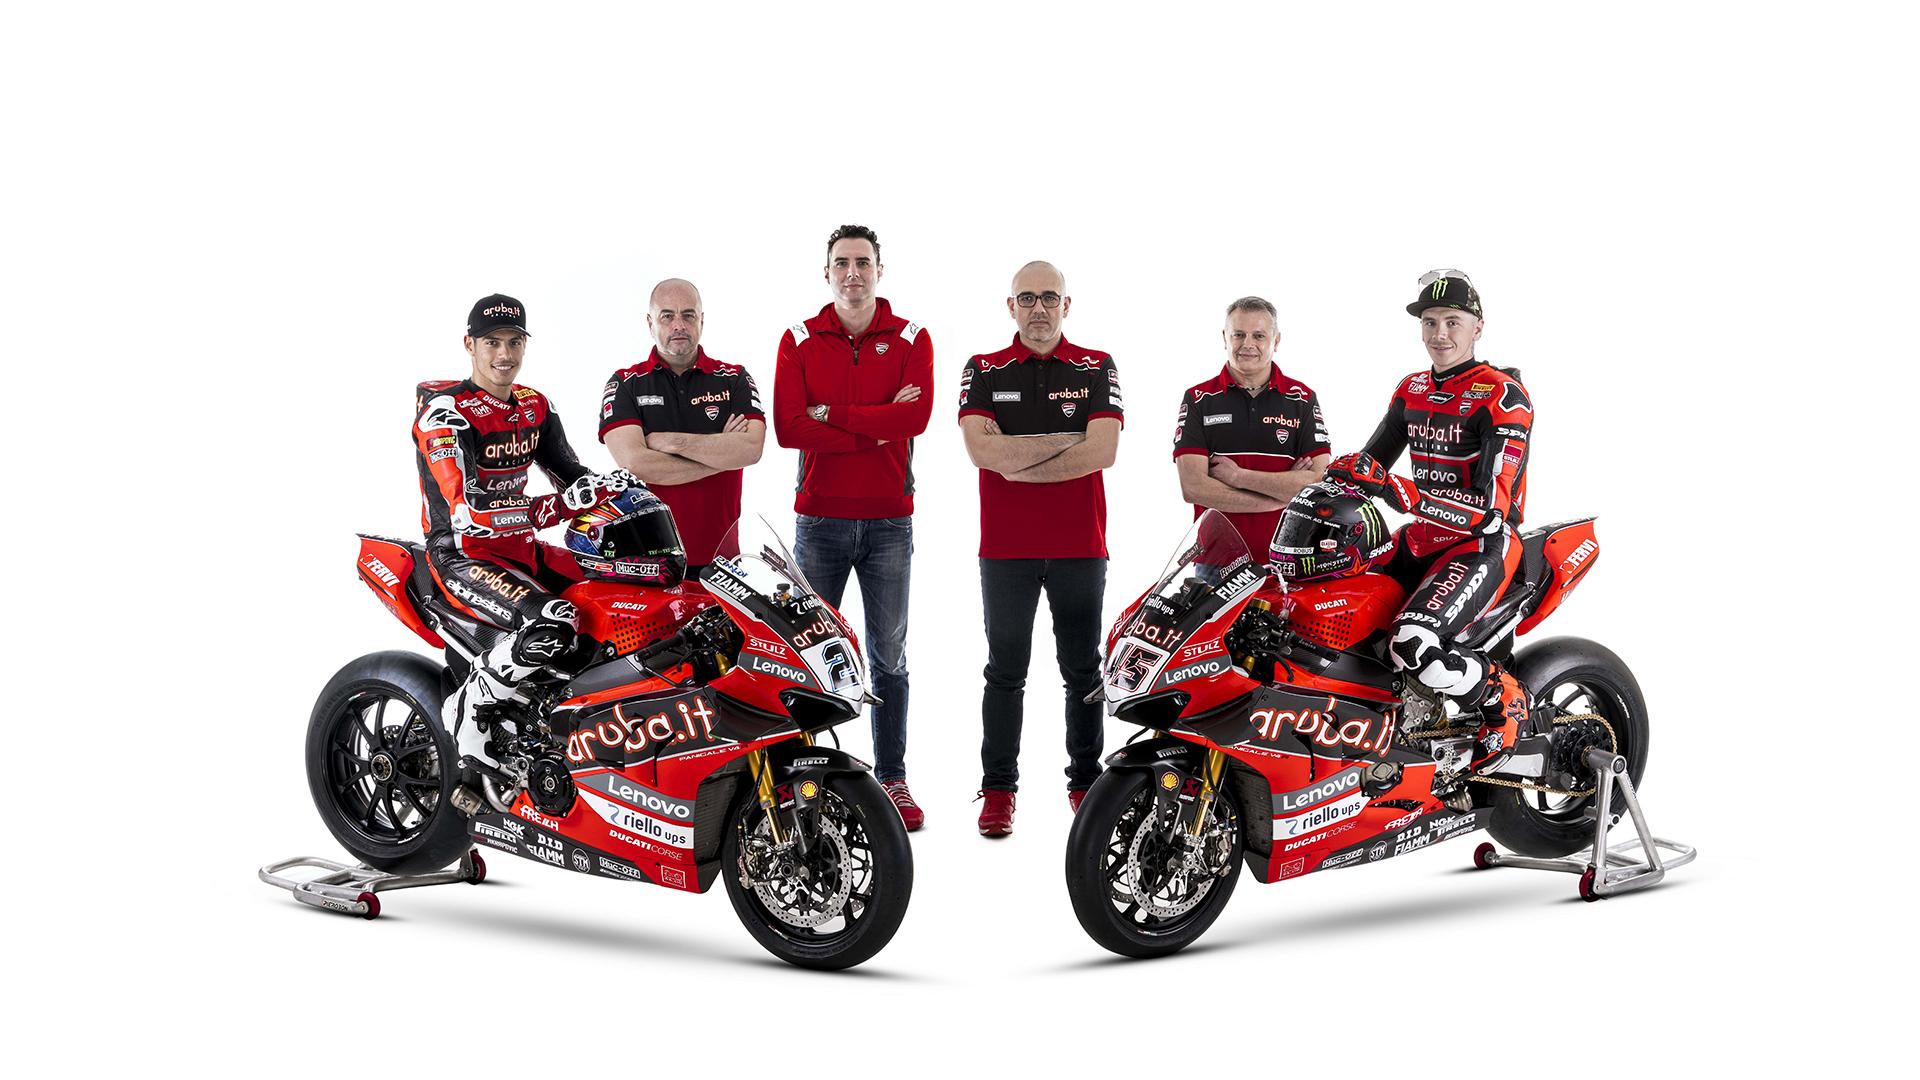 GALLERY - Superbike, the brand new Ducati Aruba by Scott Redding and Michael Rinaldi - Motor Informed